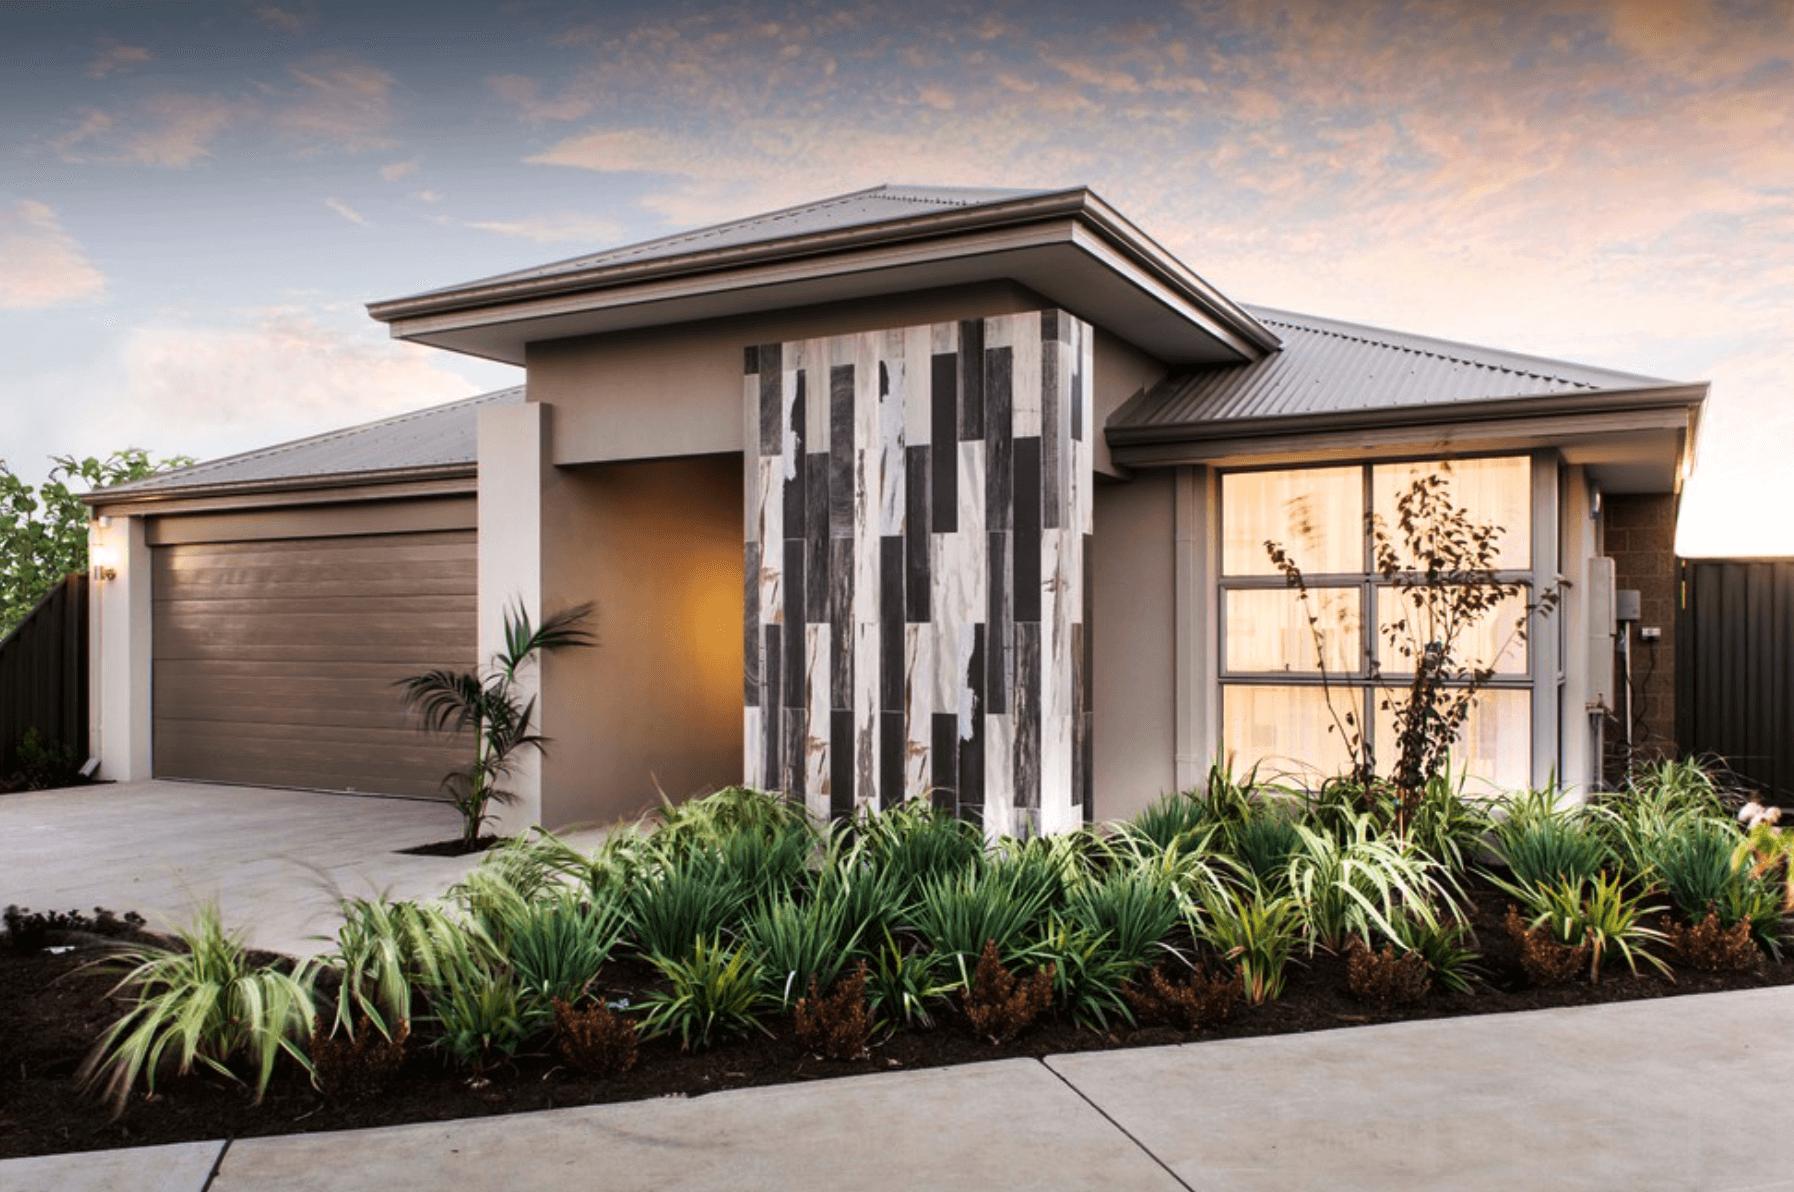 Casas bonitas modernas e simples arquidicas - Fachada de casas ...